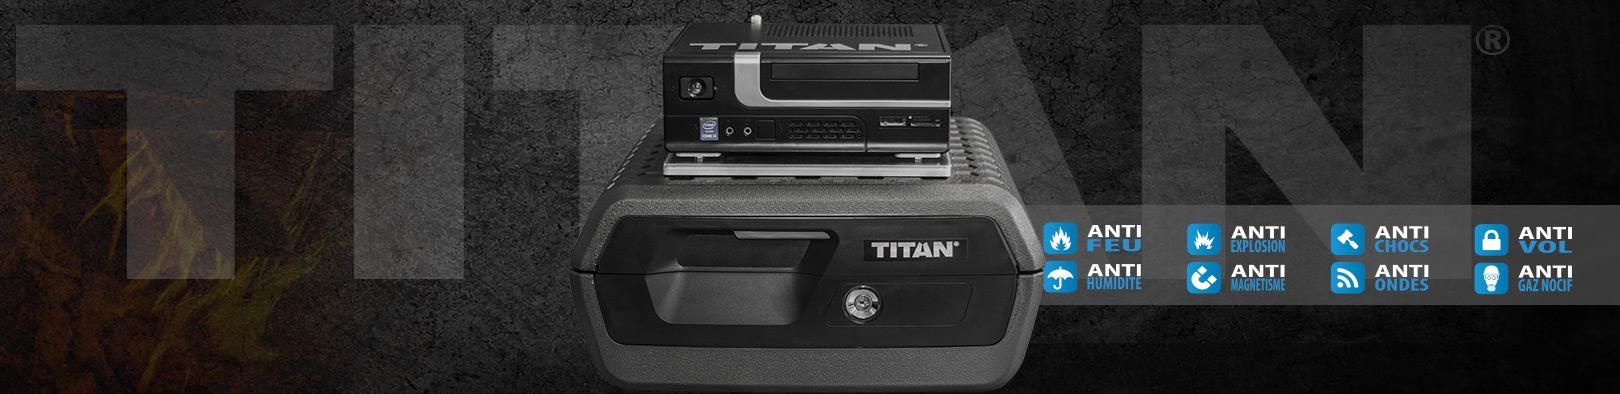 titan ged logiciel